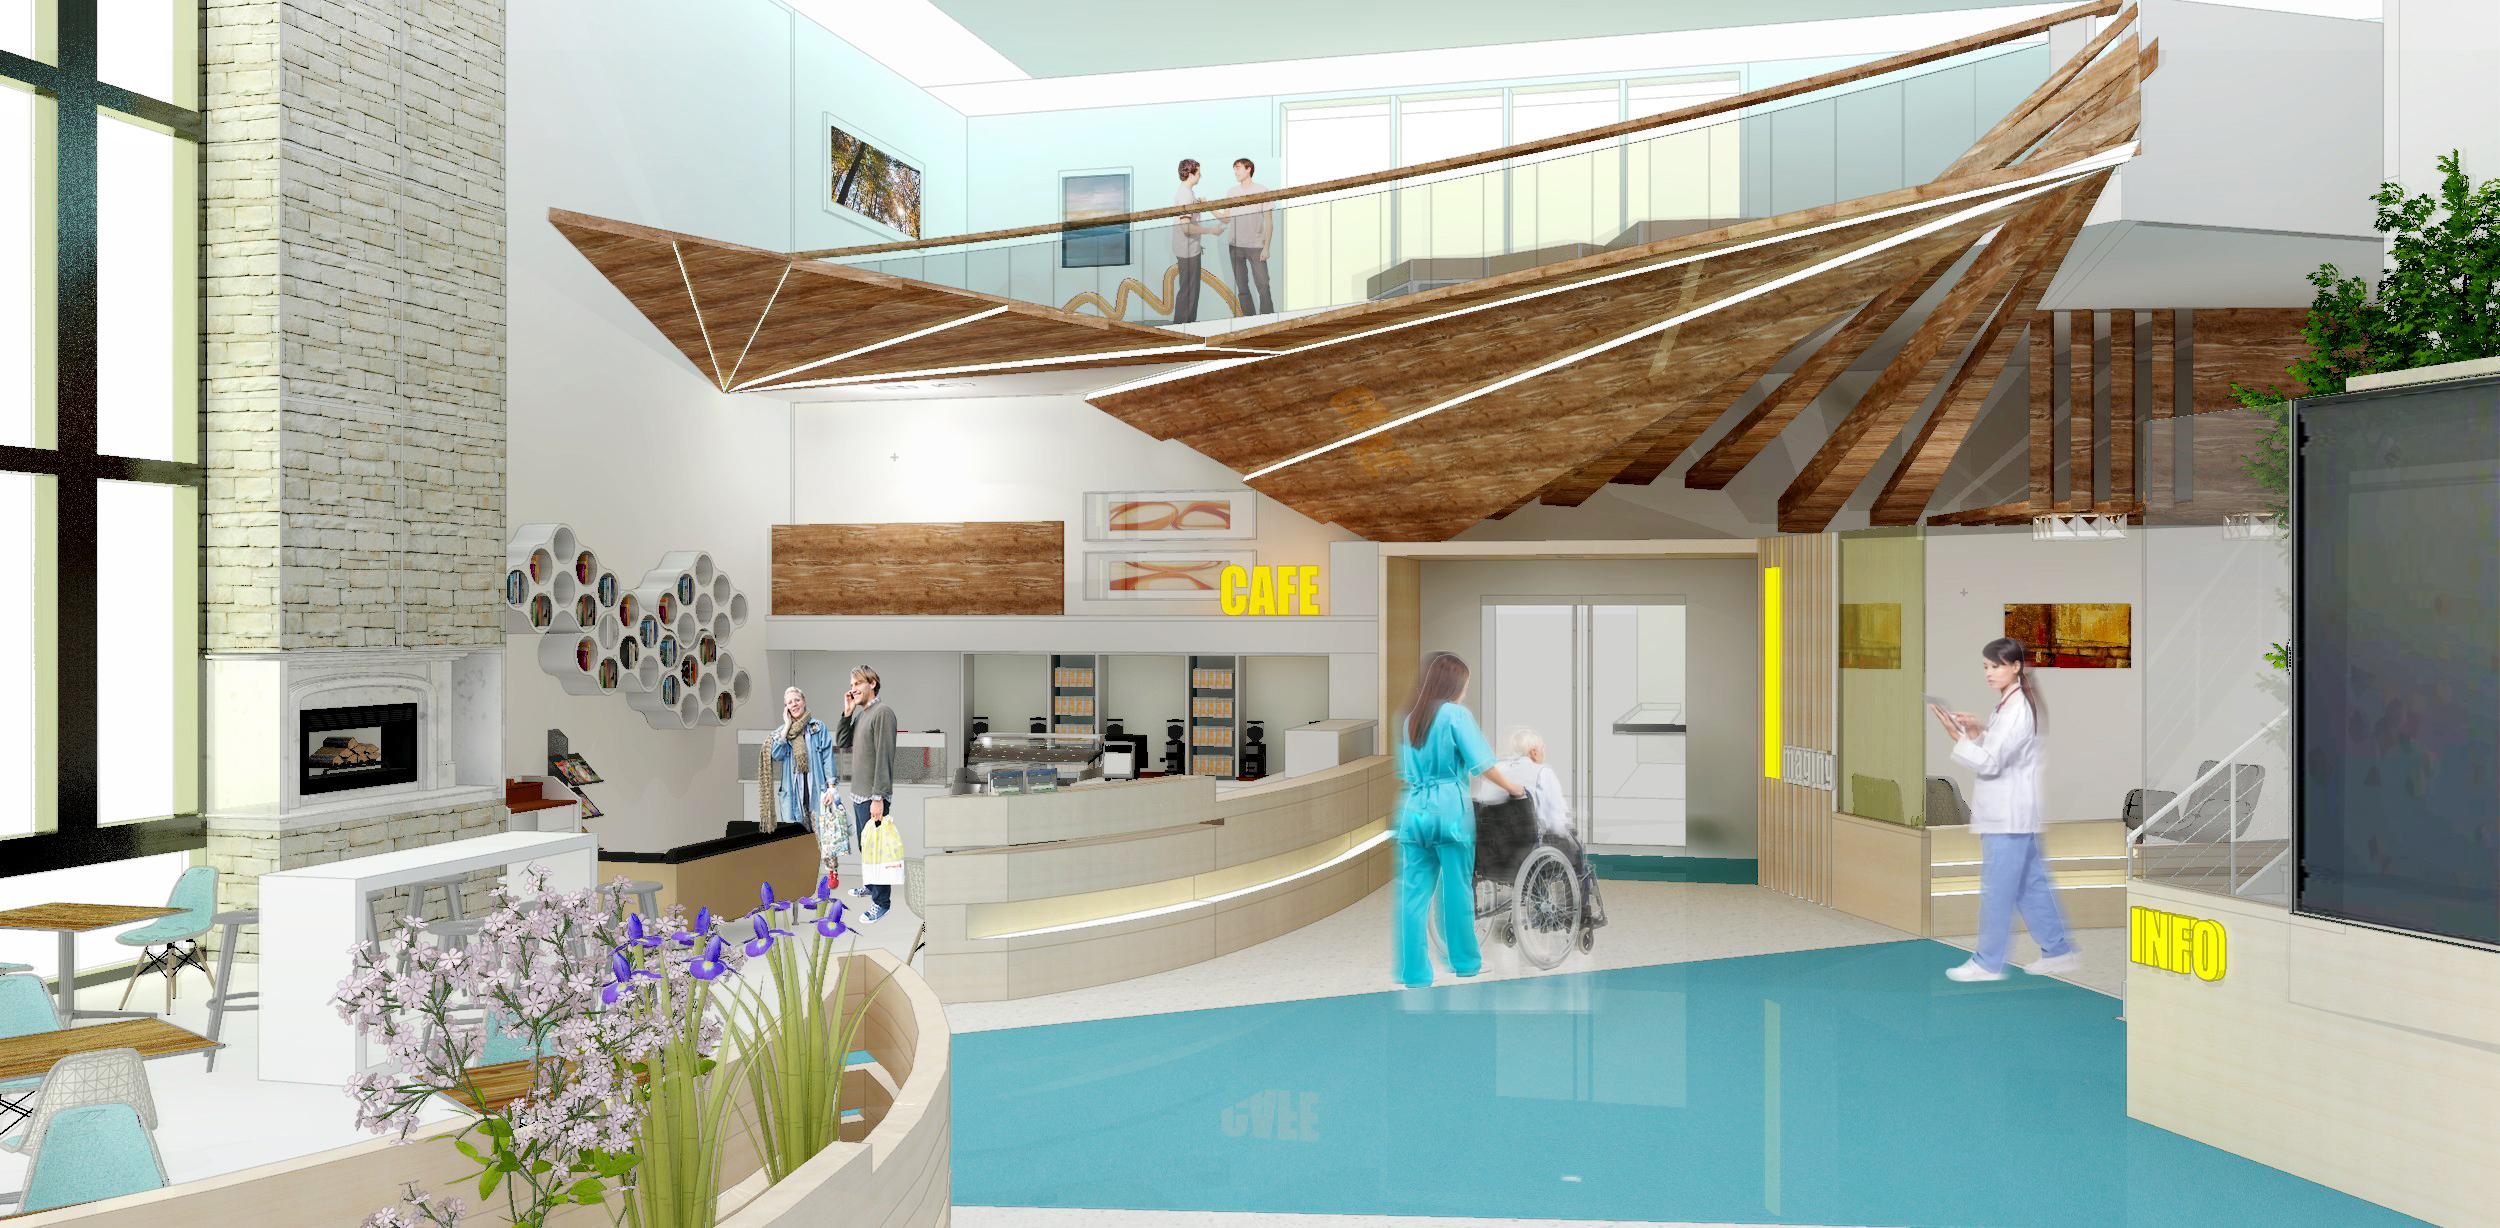 raven-carter-elisabeth-croy-shijun-cui-bayshore-cancer-center-mps-healthcare-interior-design-project_17455999338_o.jpg